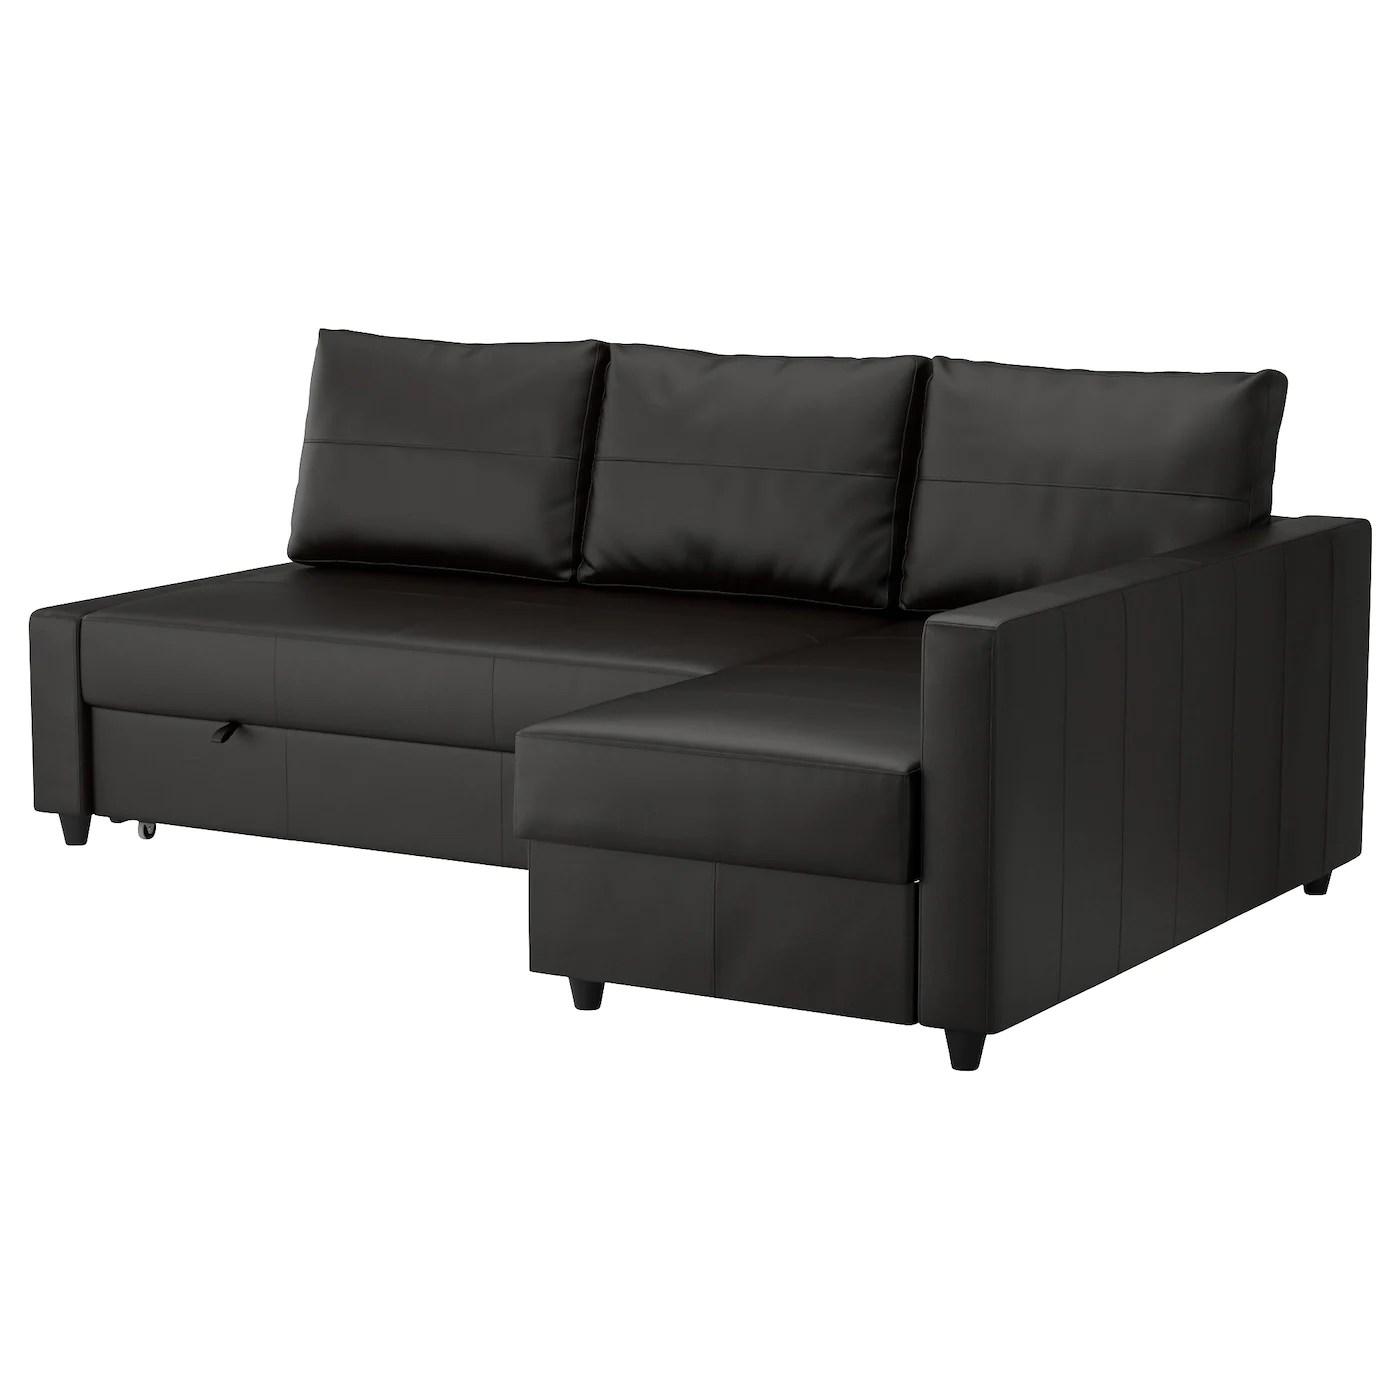 Sleeper Sectional 3 Seat W Storage Friheten Bomstad Black